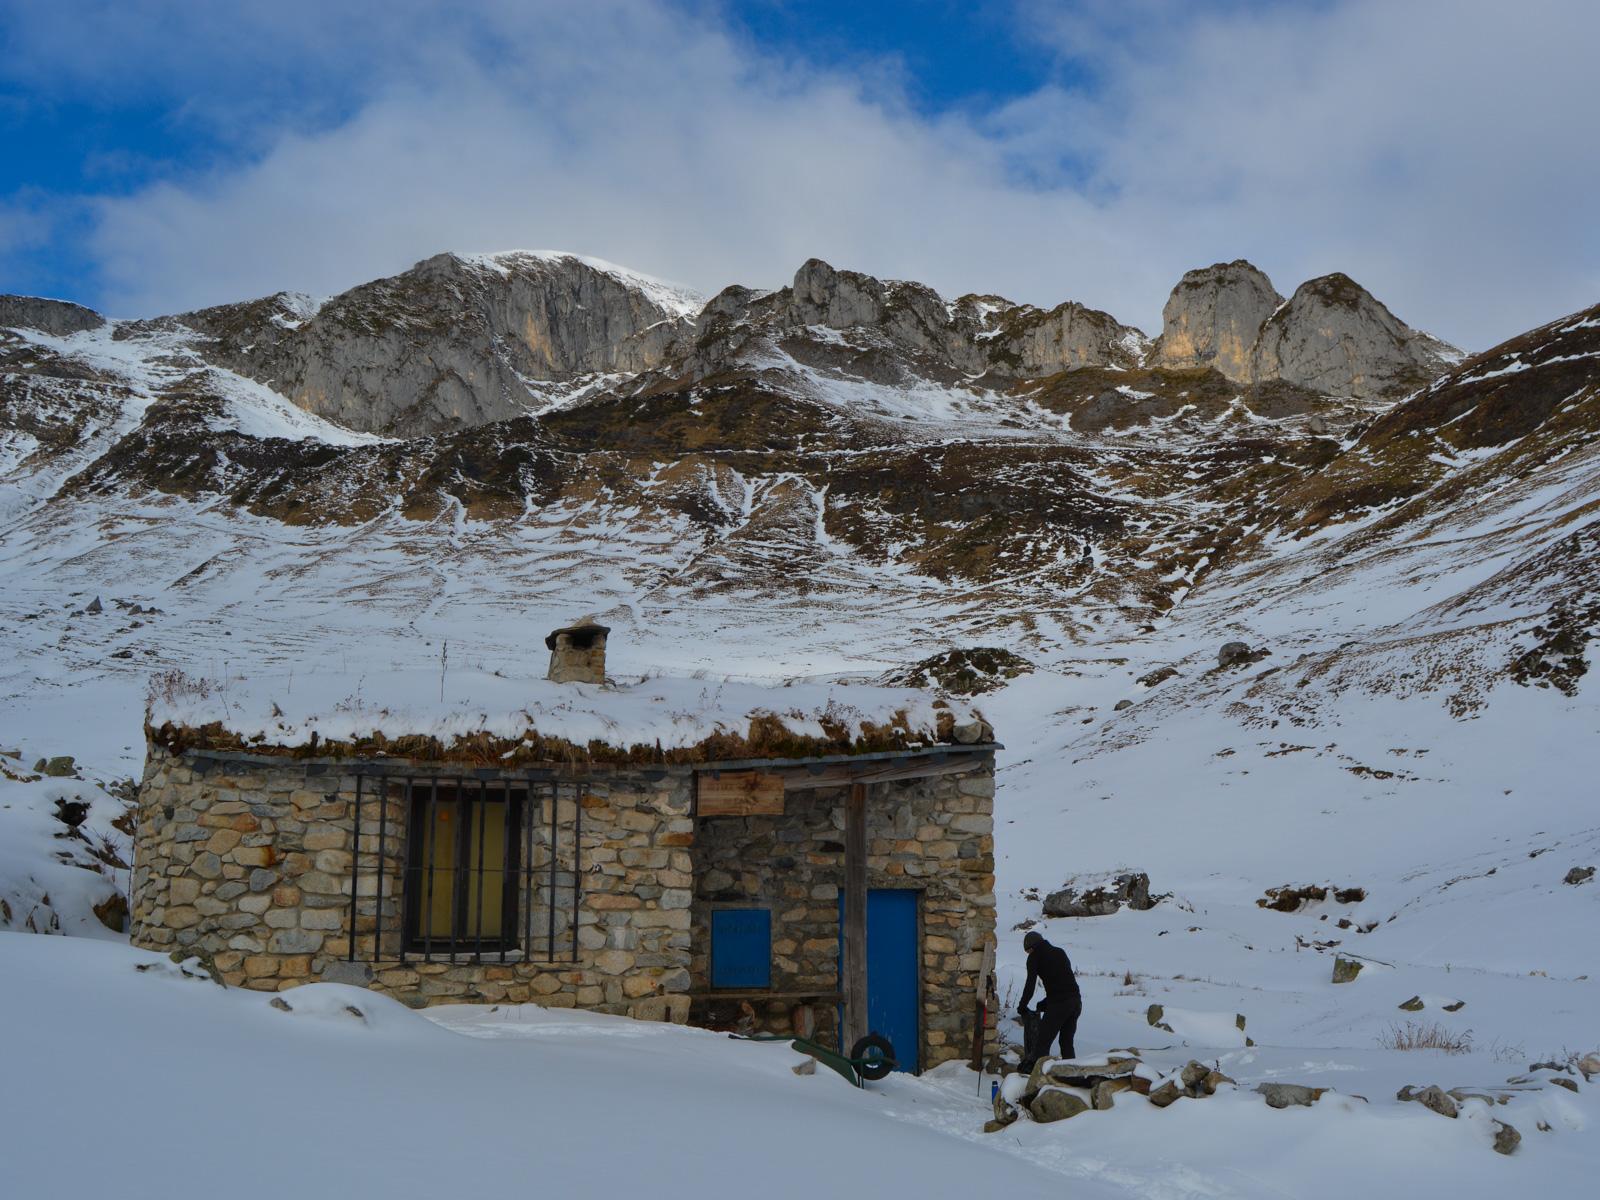 Ariège sous la neige, enfin ! 8